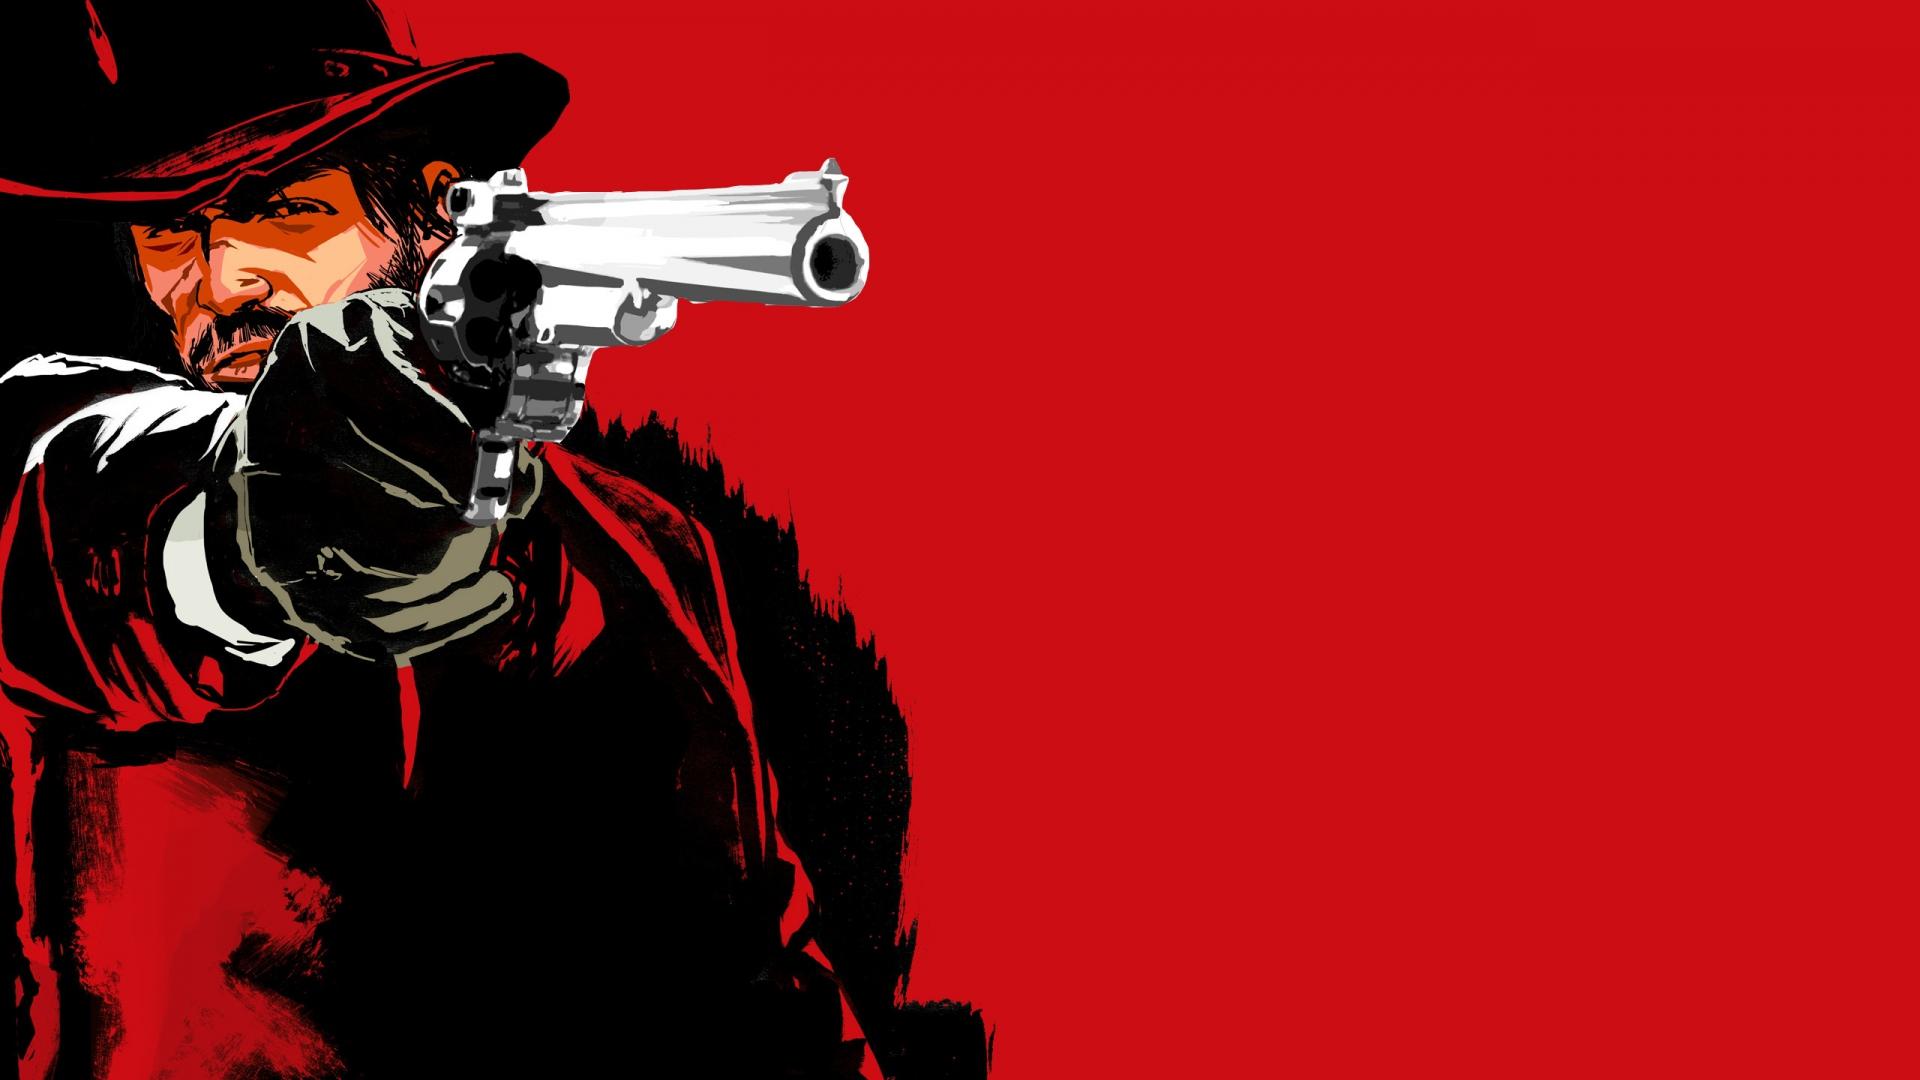 Red dead redemption game Pistol Cowboy Hat Wallpaper Background 1920x1080